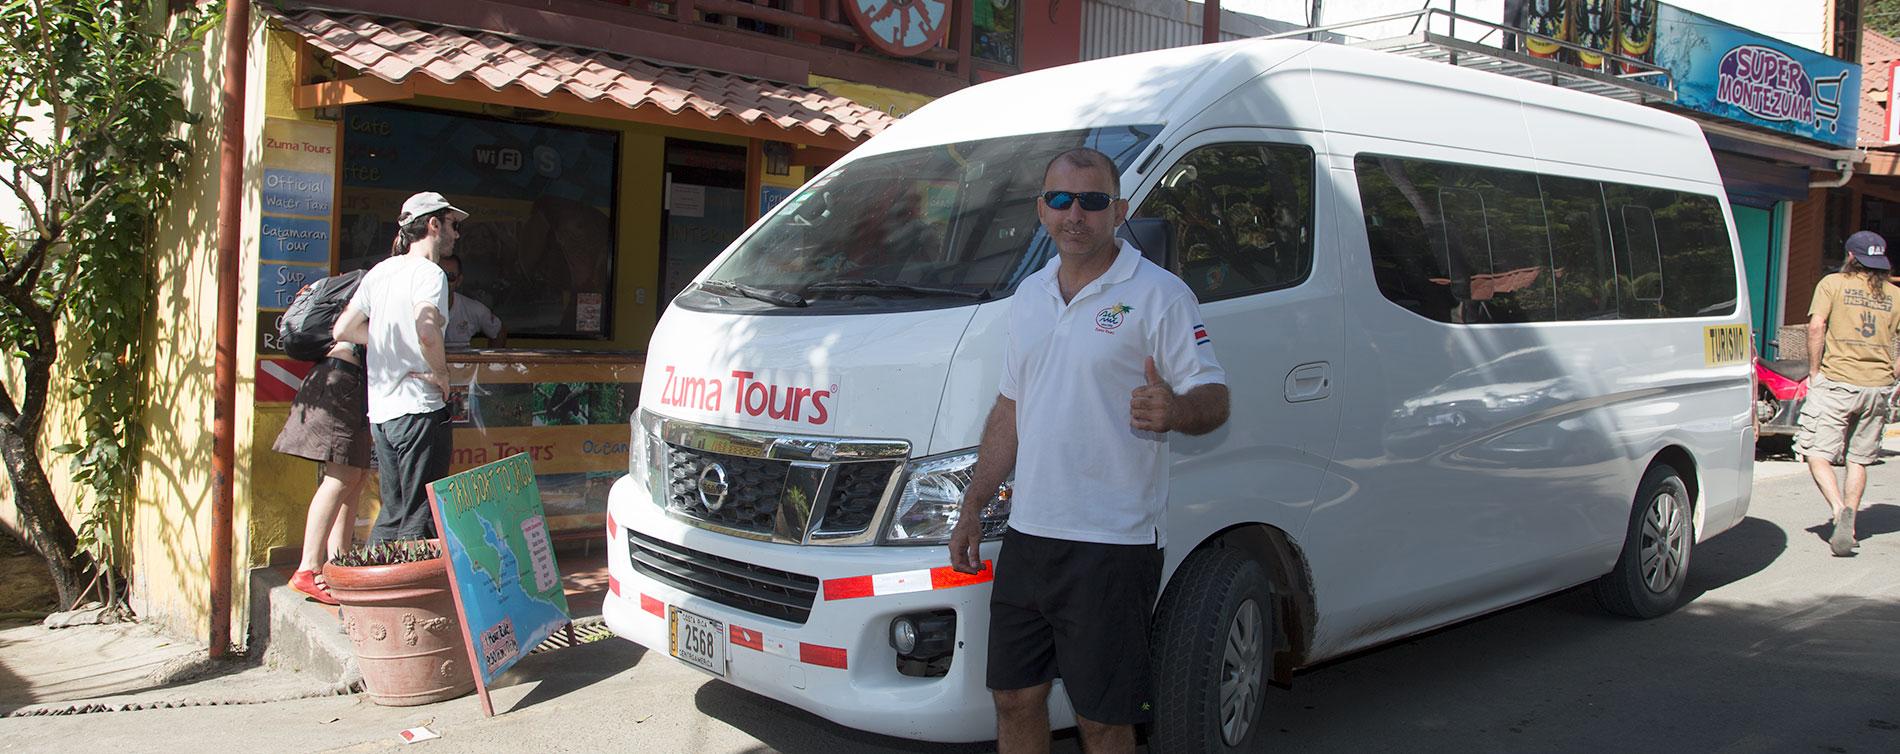 Zuma Tours Transfers & Shuttles